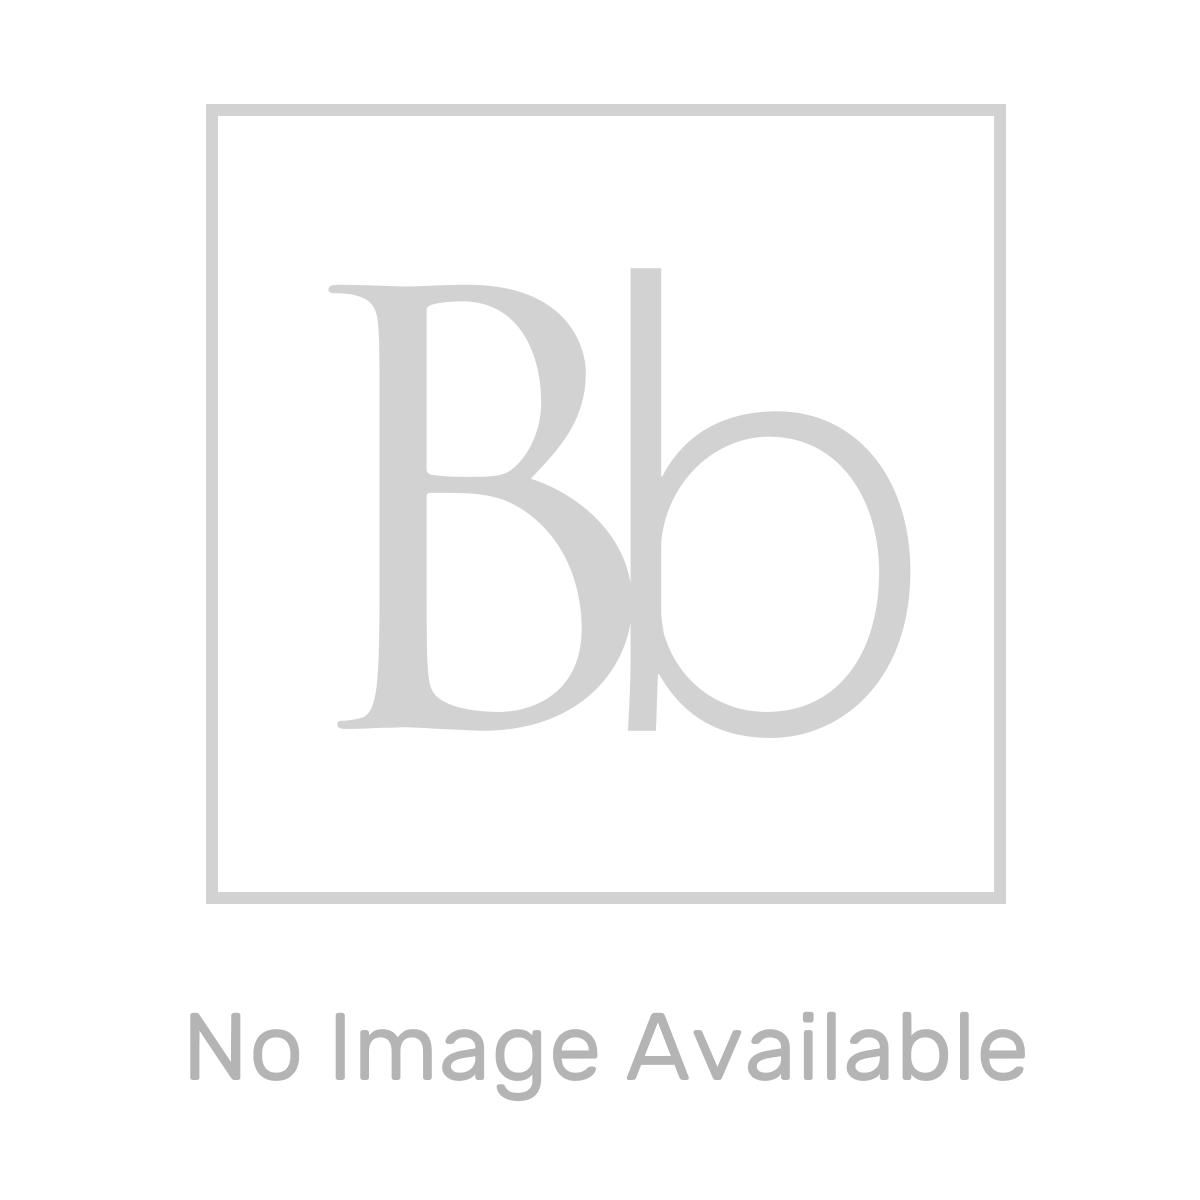 Aquadart White Slate Shower Tray 1600 x 900